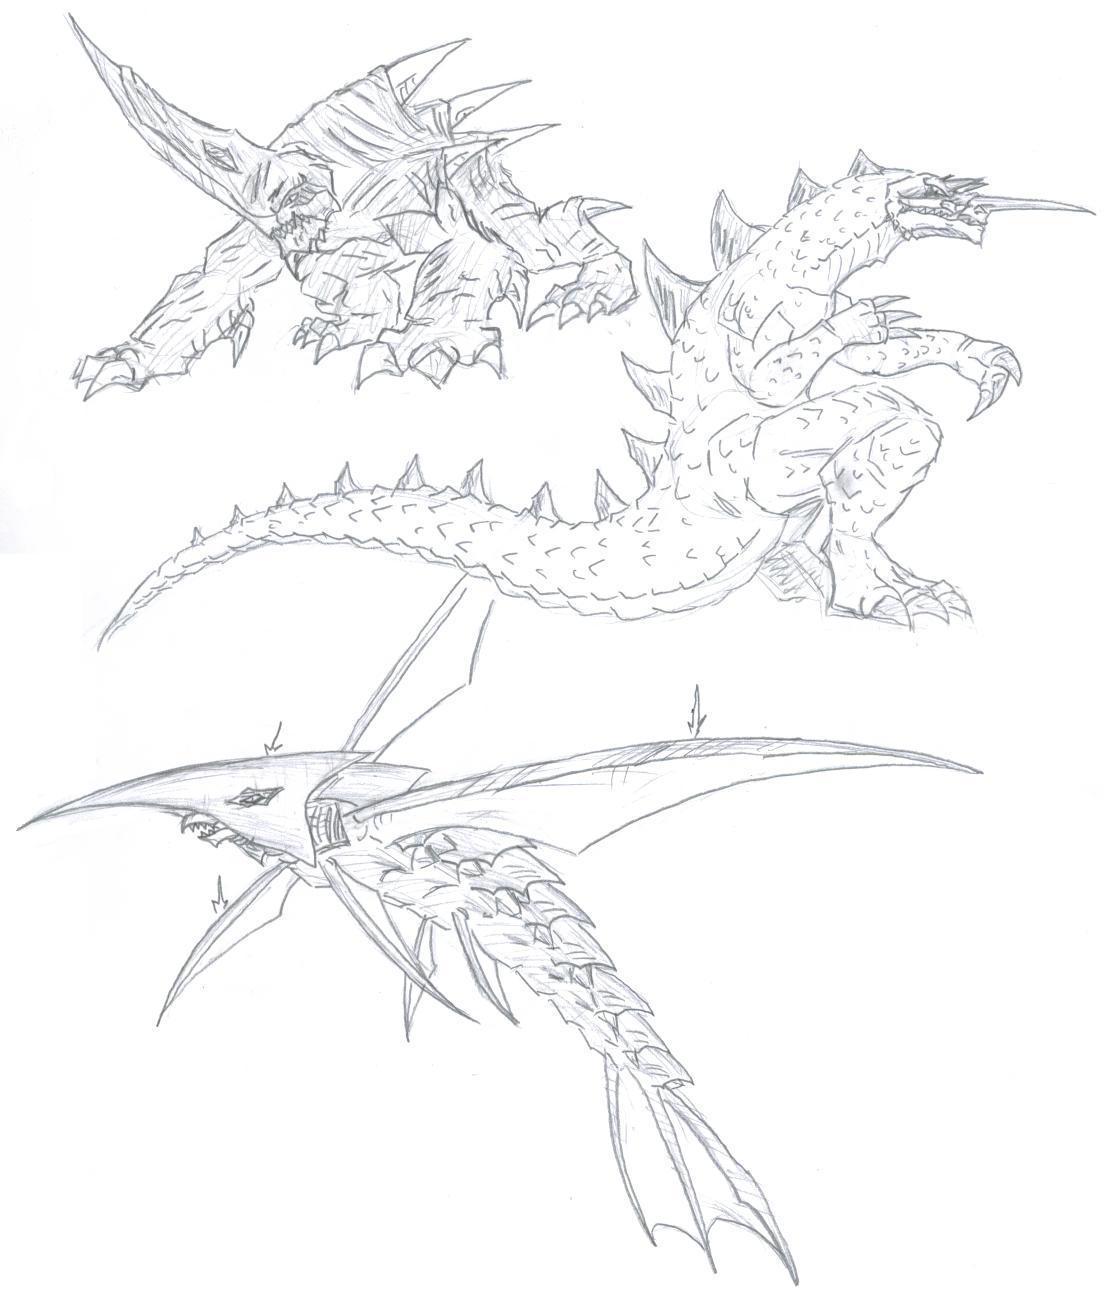 gamera enemies  by chaosghidorah on deviantart